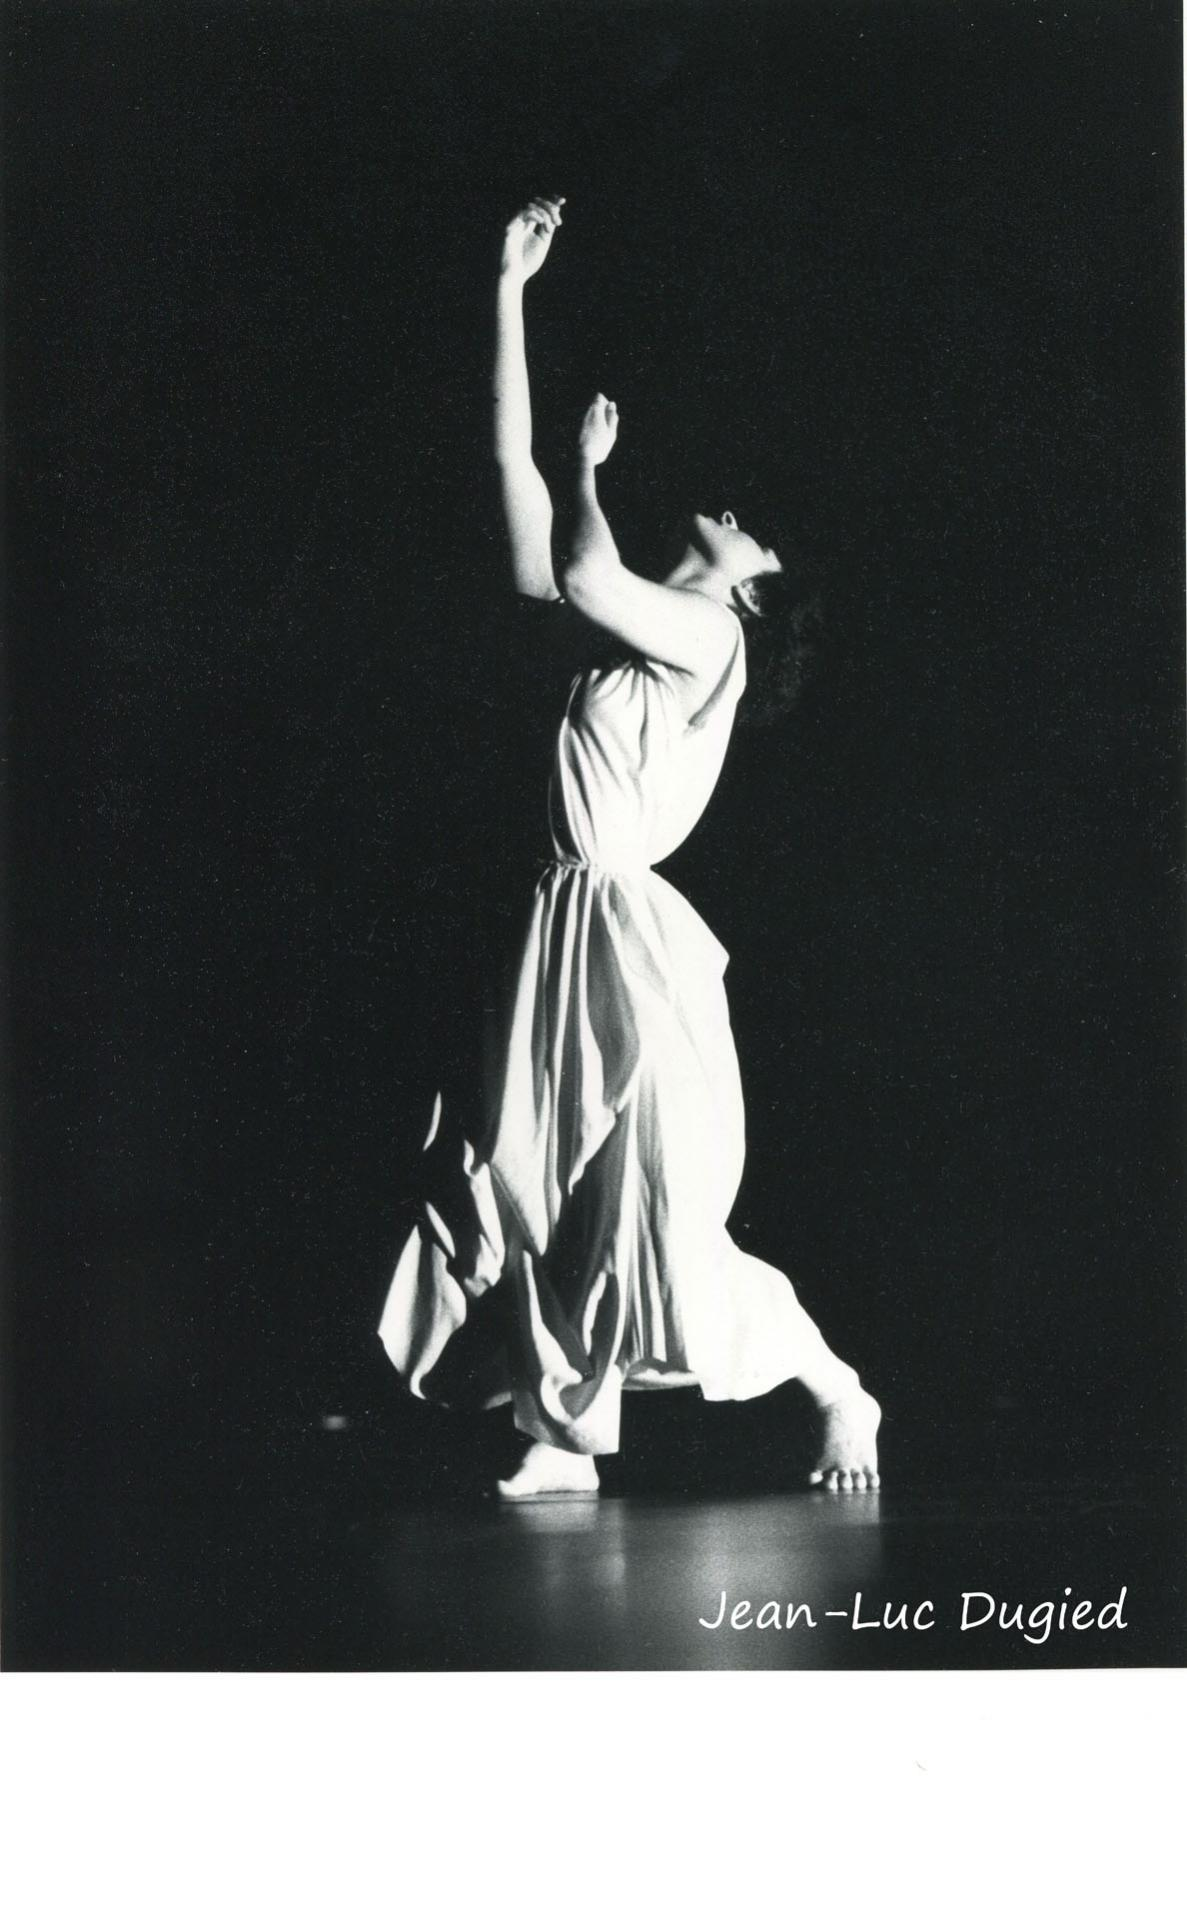 19 Roussel Stéphanie - Anaïs Ophiure - 1985